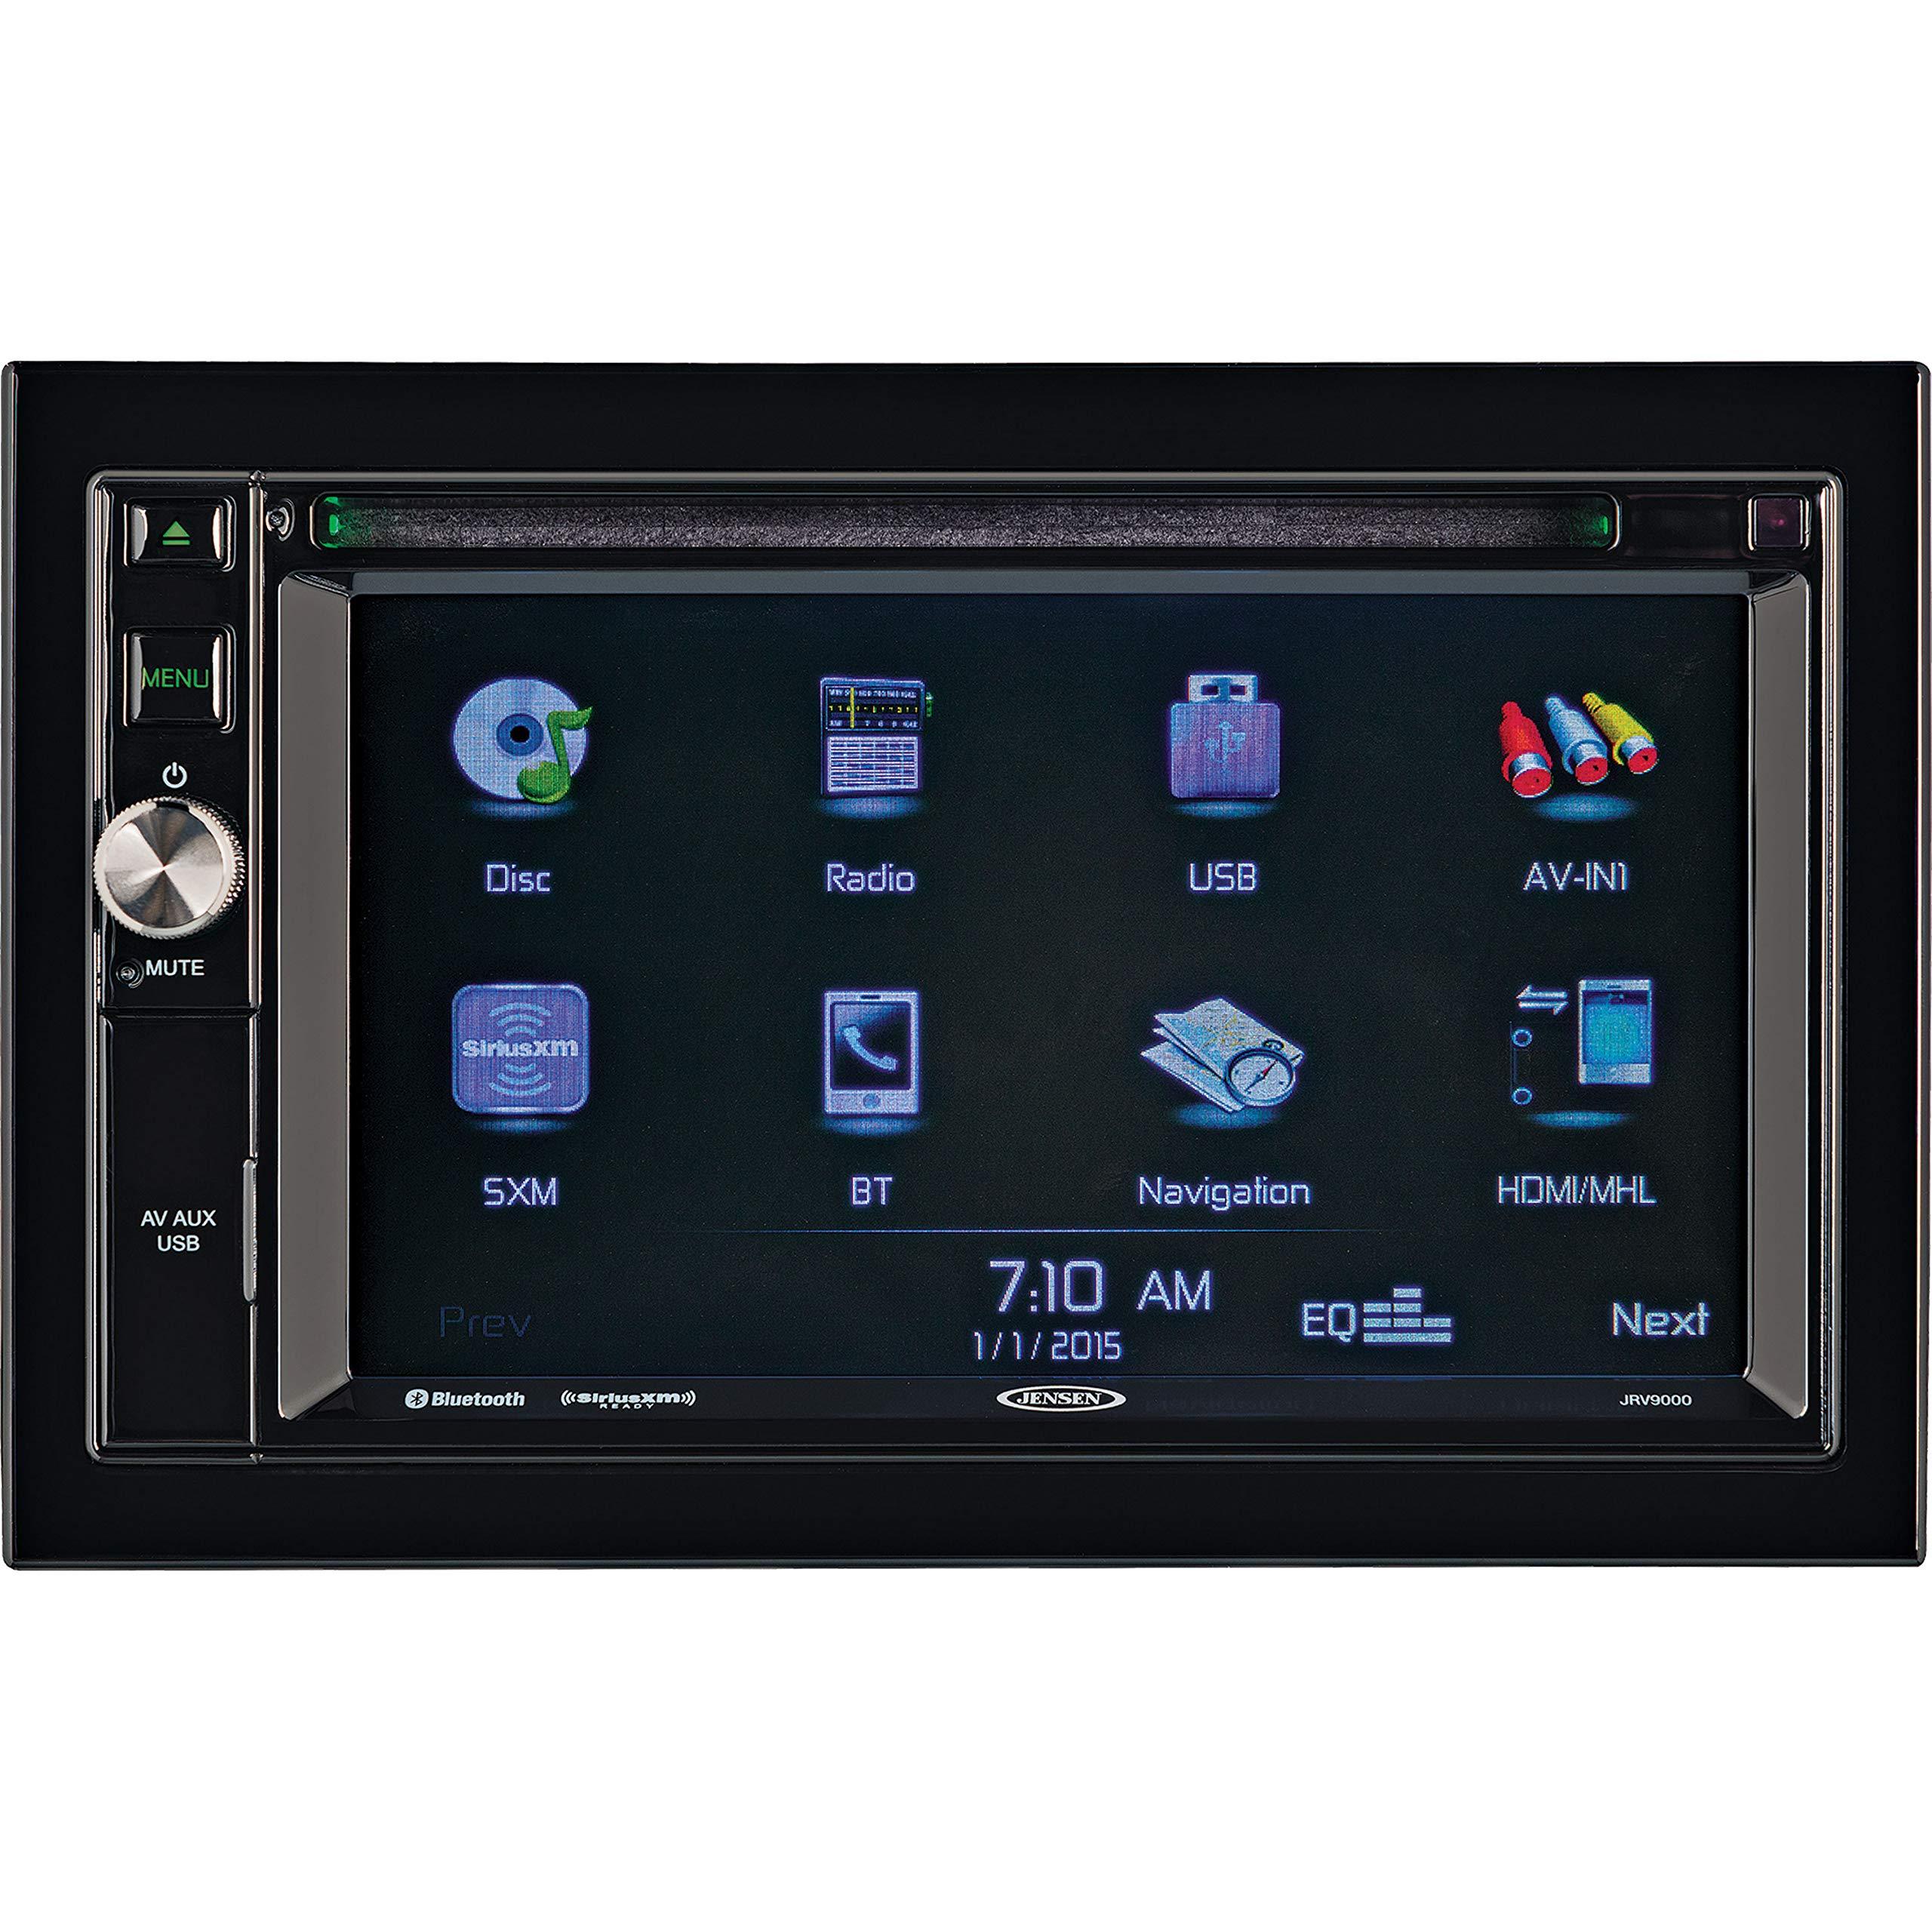 JENSEN JRV9000R 2.0 Double DIN 6.2'' Touchscreen Navigation / Bluetooth Multimedia Receiver System JRV9000 with Harness, DVD, NAV, SiriusXM Ready, BT Technology, iPhone / iPod, MHL, HDMI, USB, AV In.